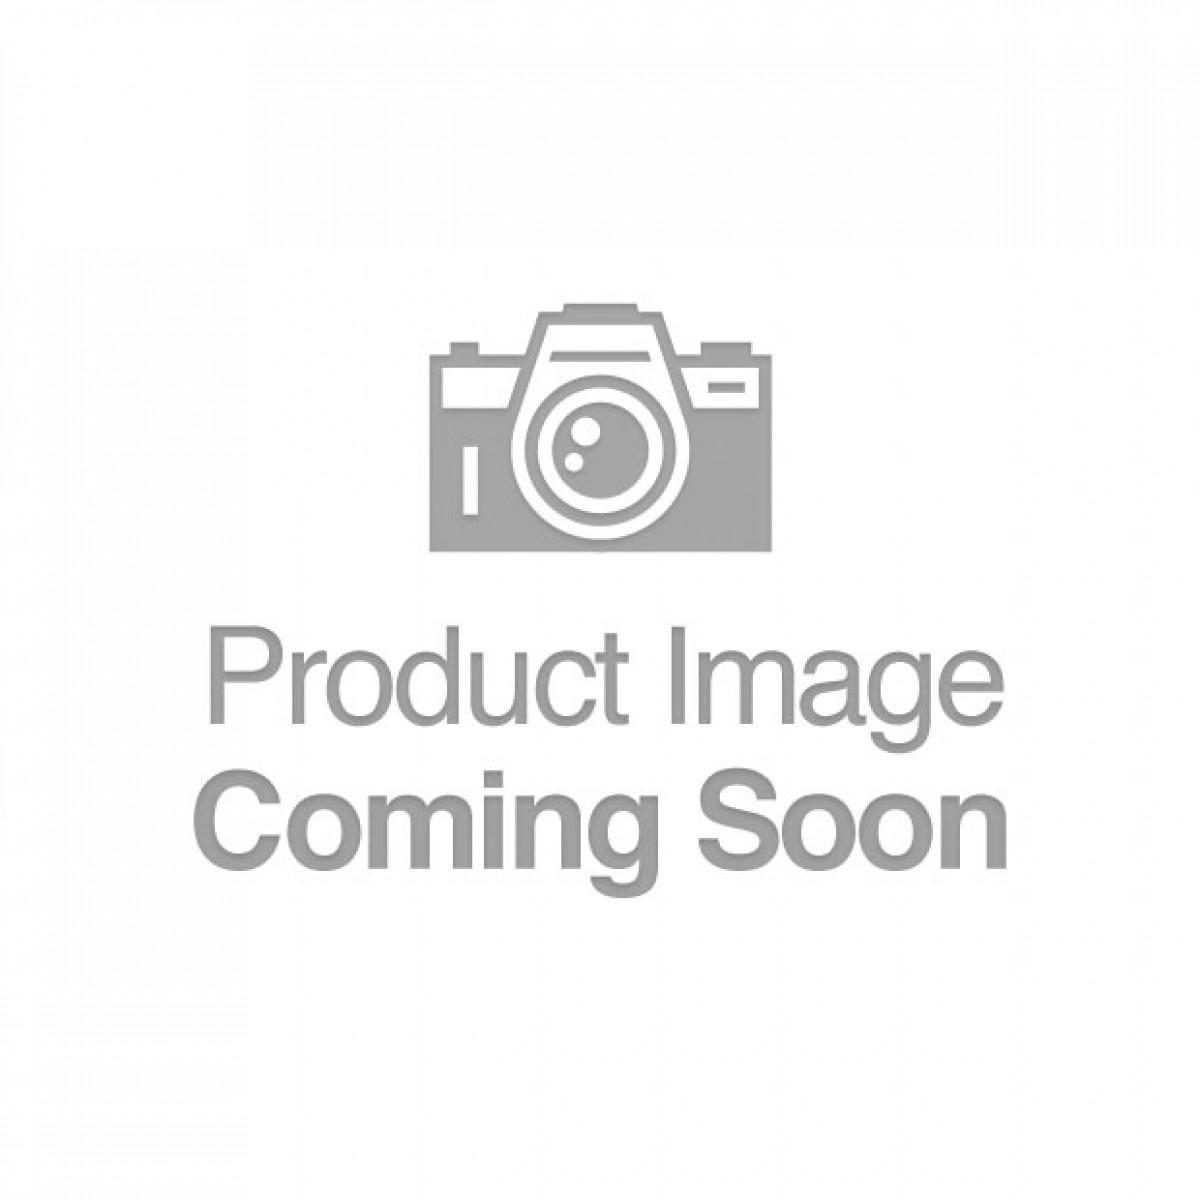 Skins Aqua Water Based Lubricant - 4.4 oz